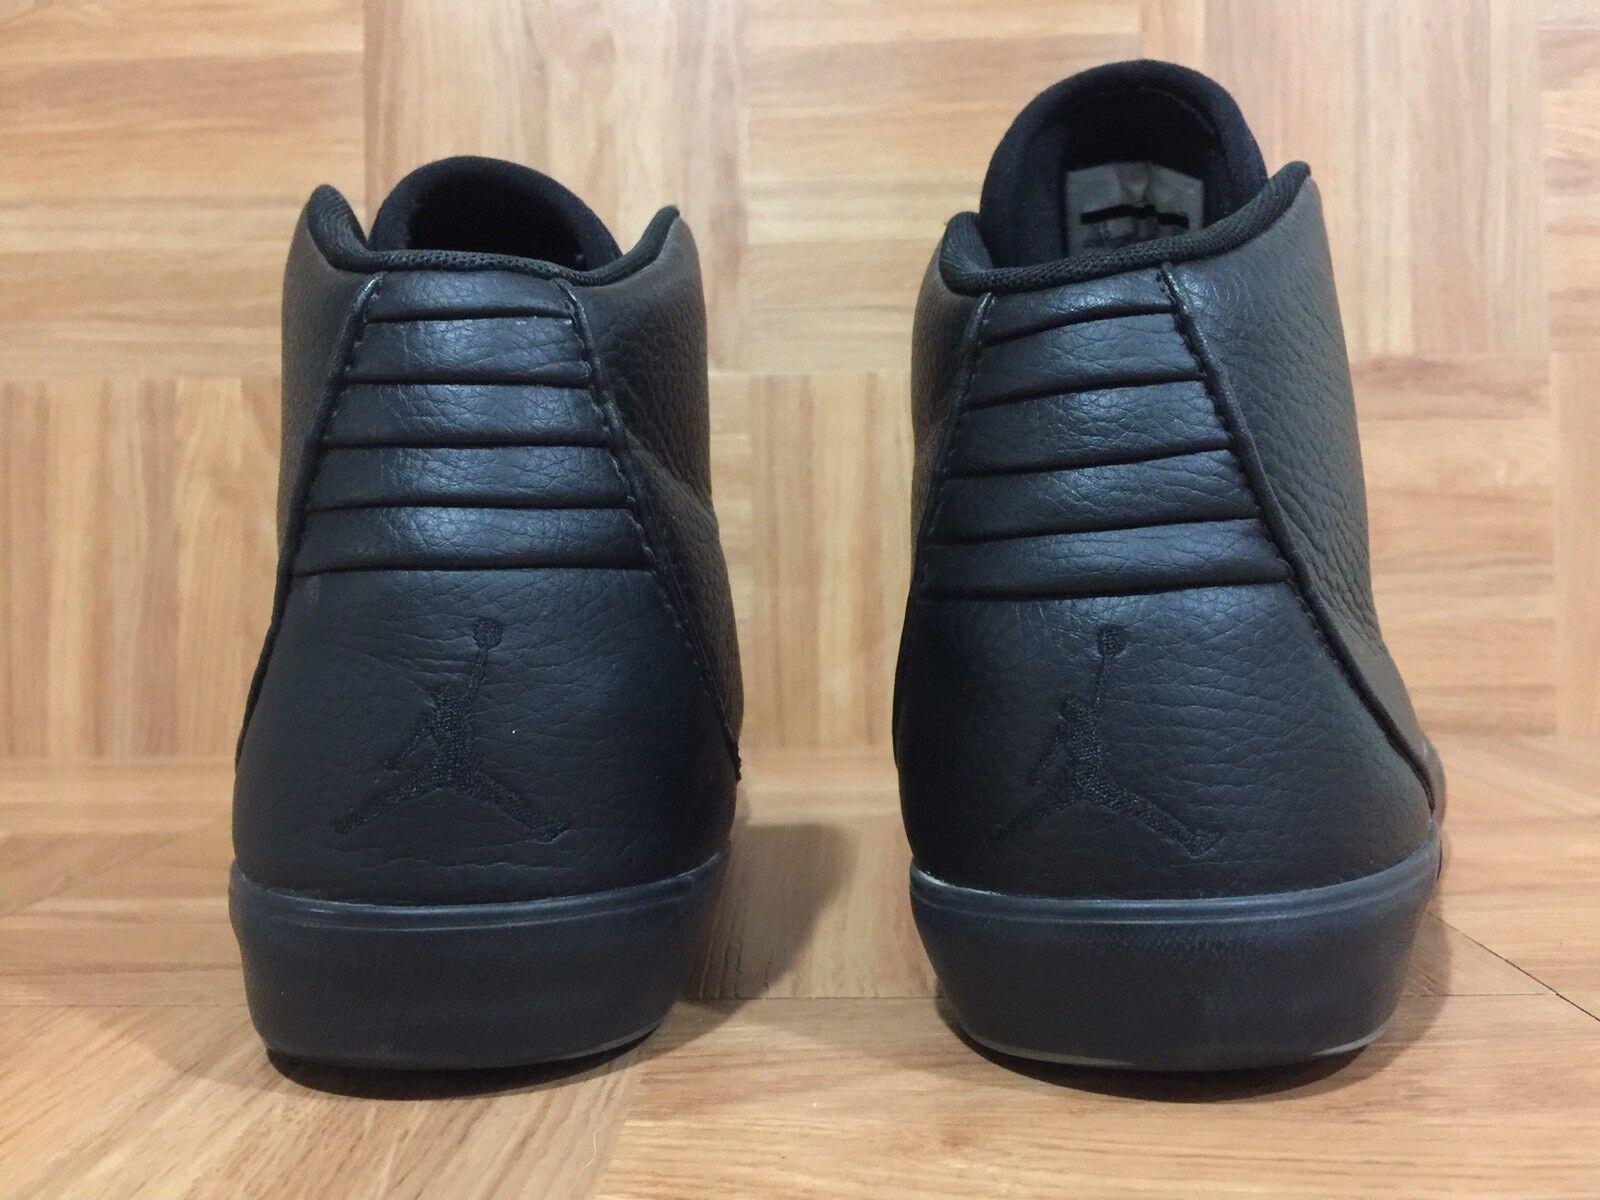 timeless design 1d6d5 552a0 ... RARE Nike Air Jordan Jordan Jordan V.9 Grown Mid Black Leather shoes Sz  10 ...